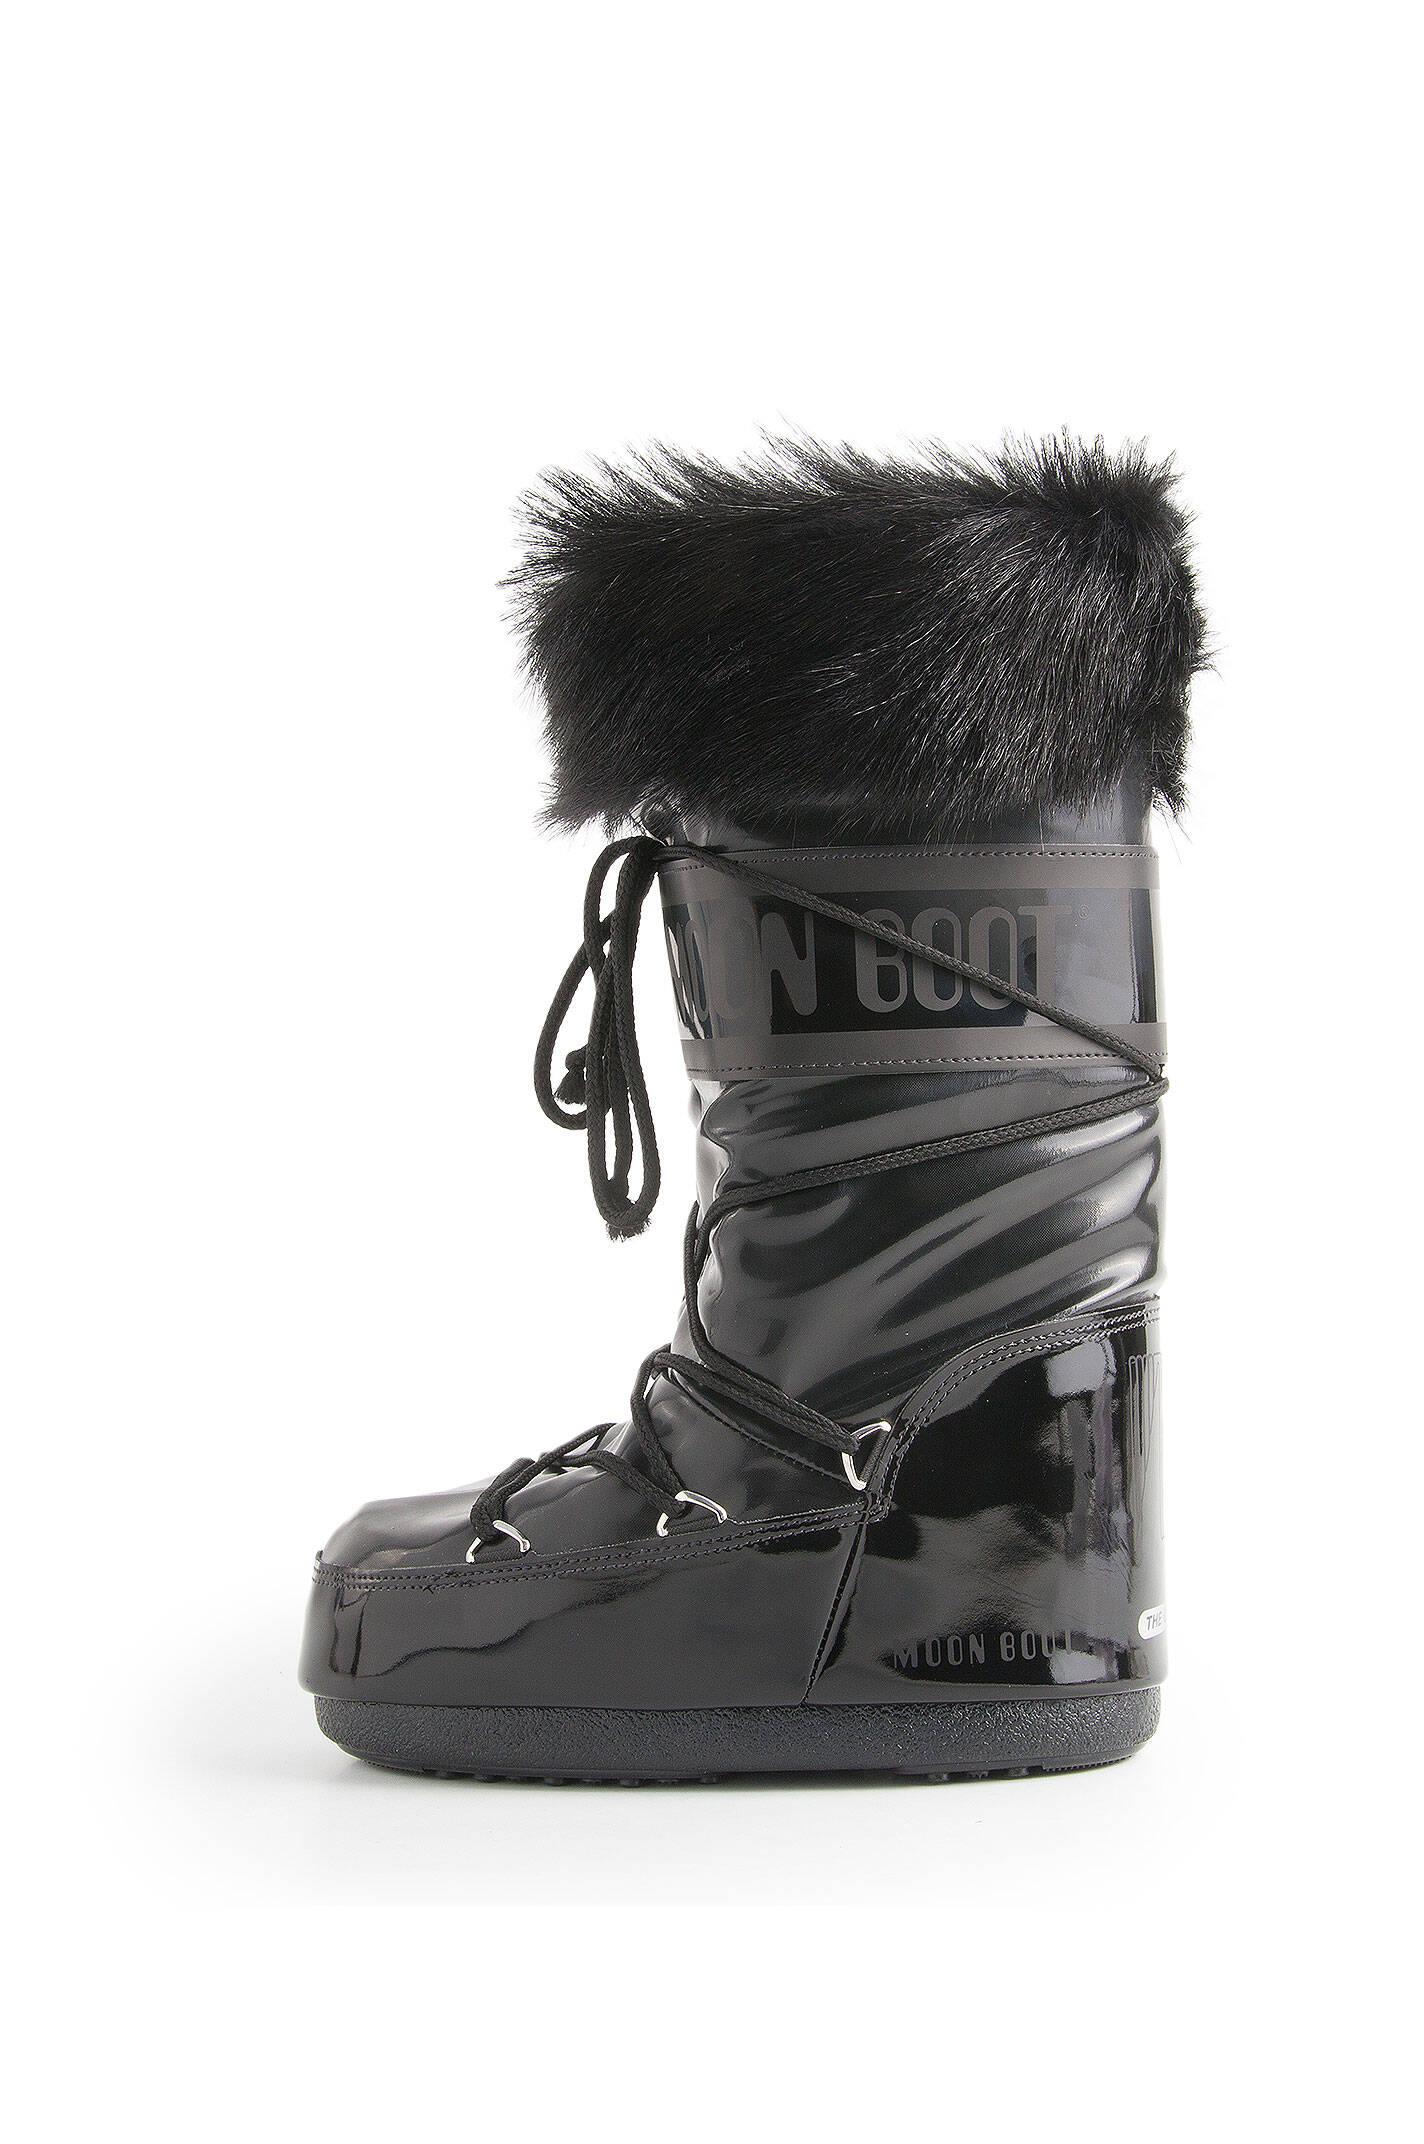 boot vail moonboots moon boot black boots gomez pl